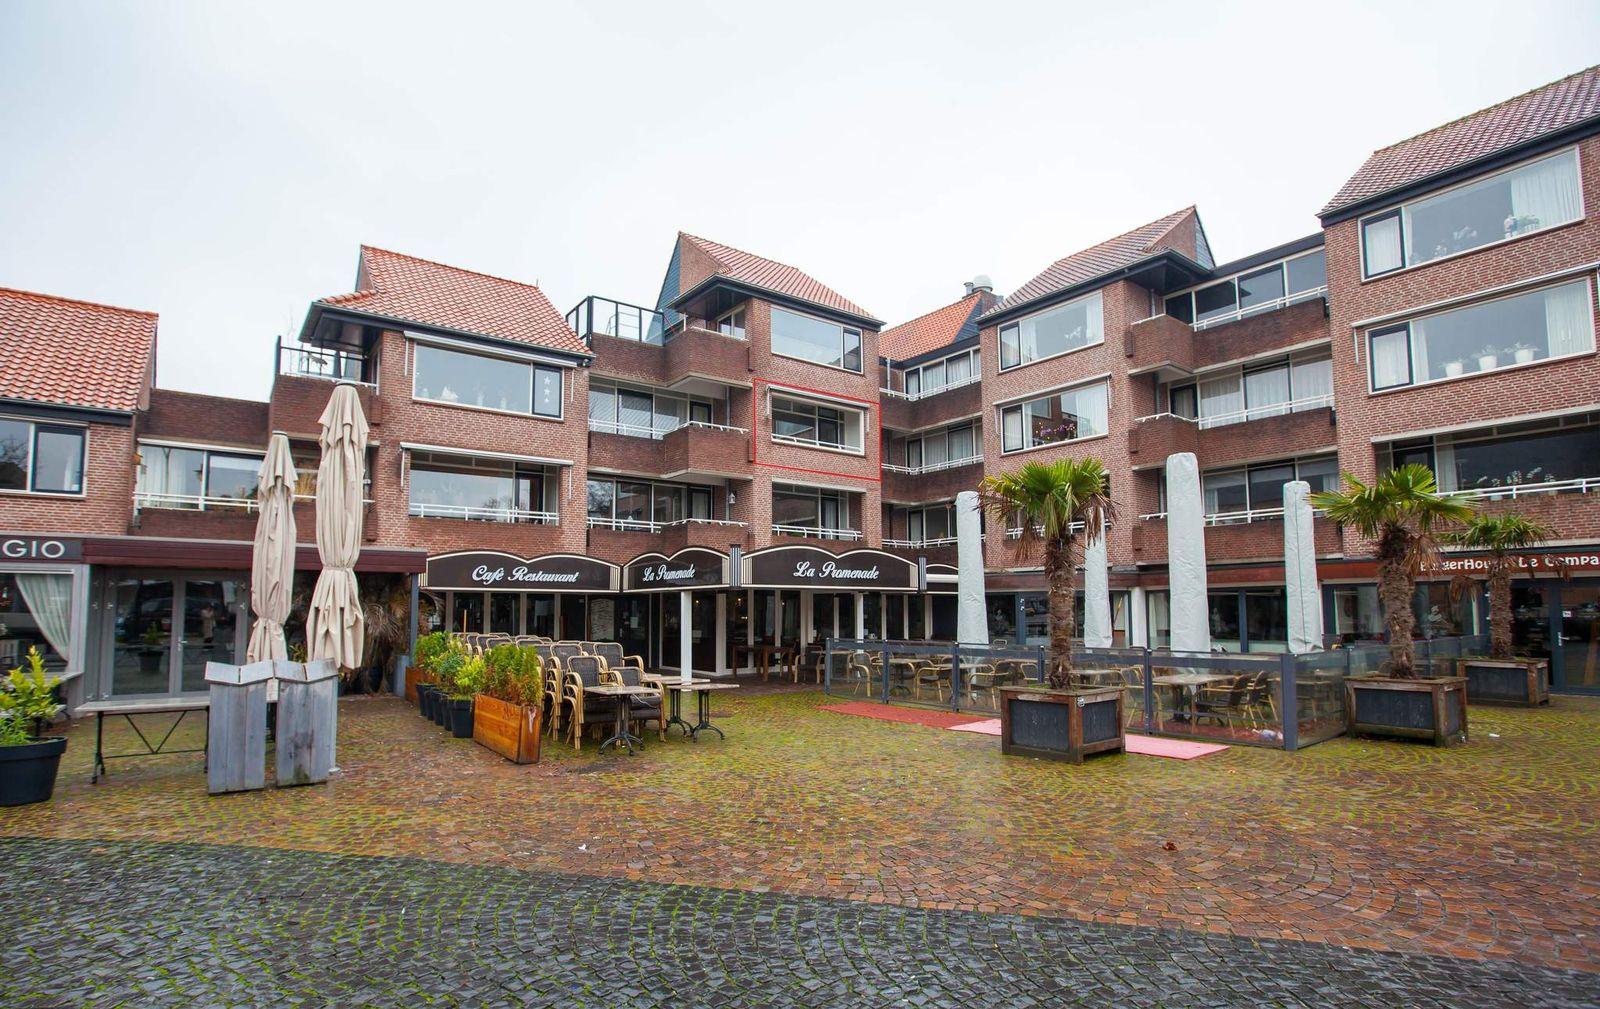 Wheme 59, Winterswijk